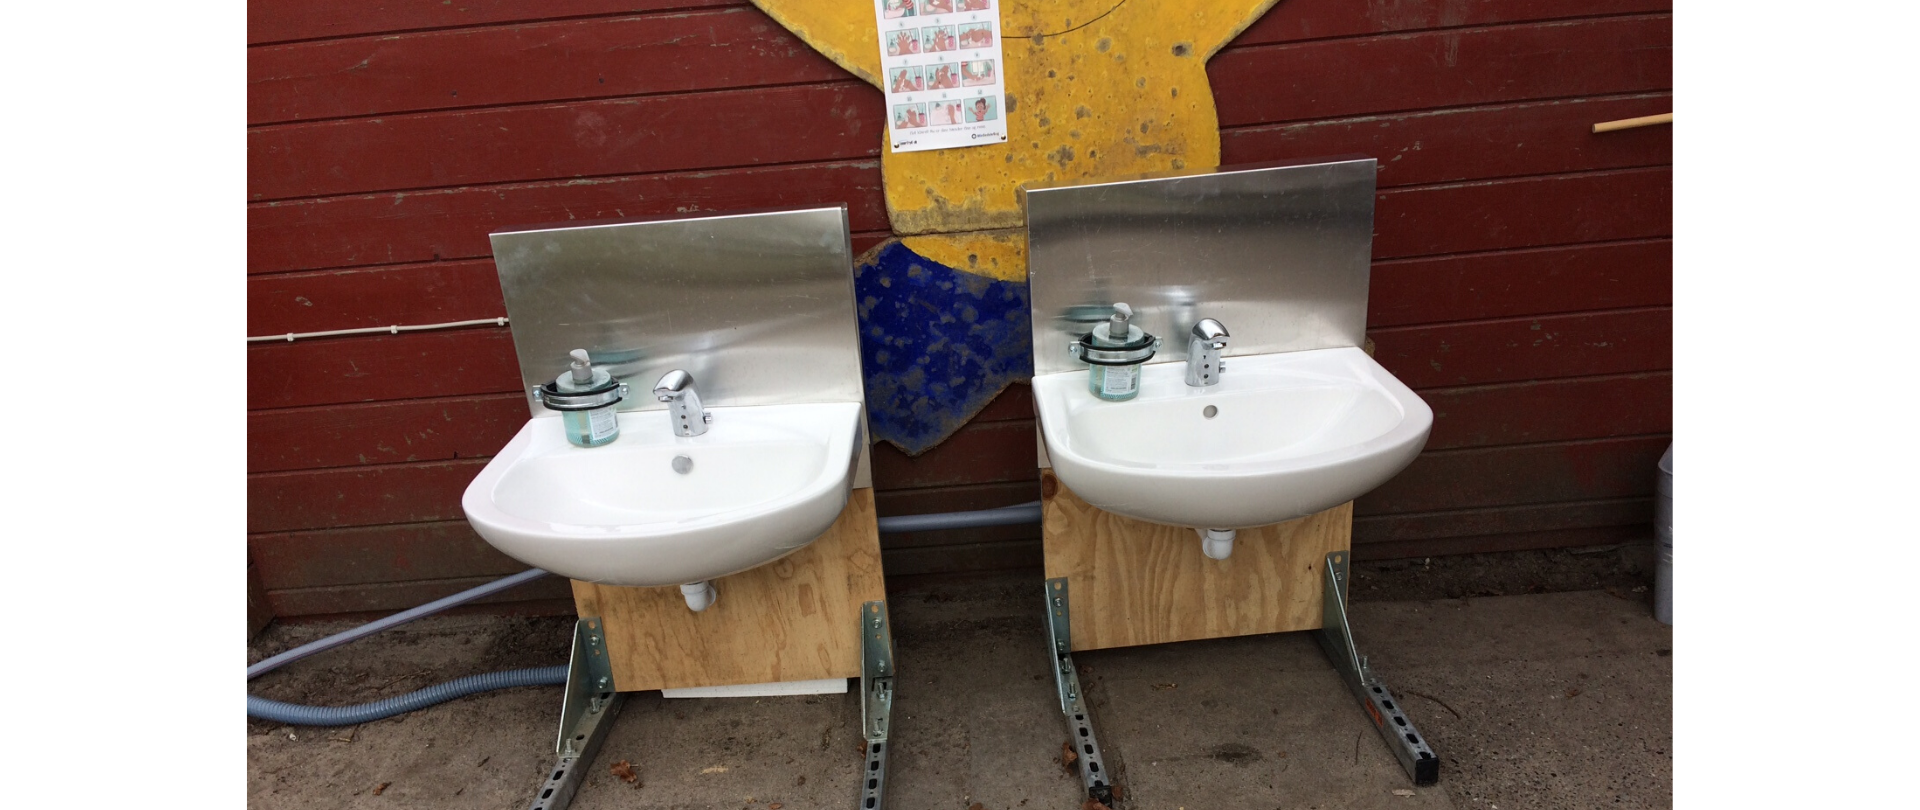 håndvask børnehave covid-19